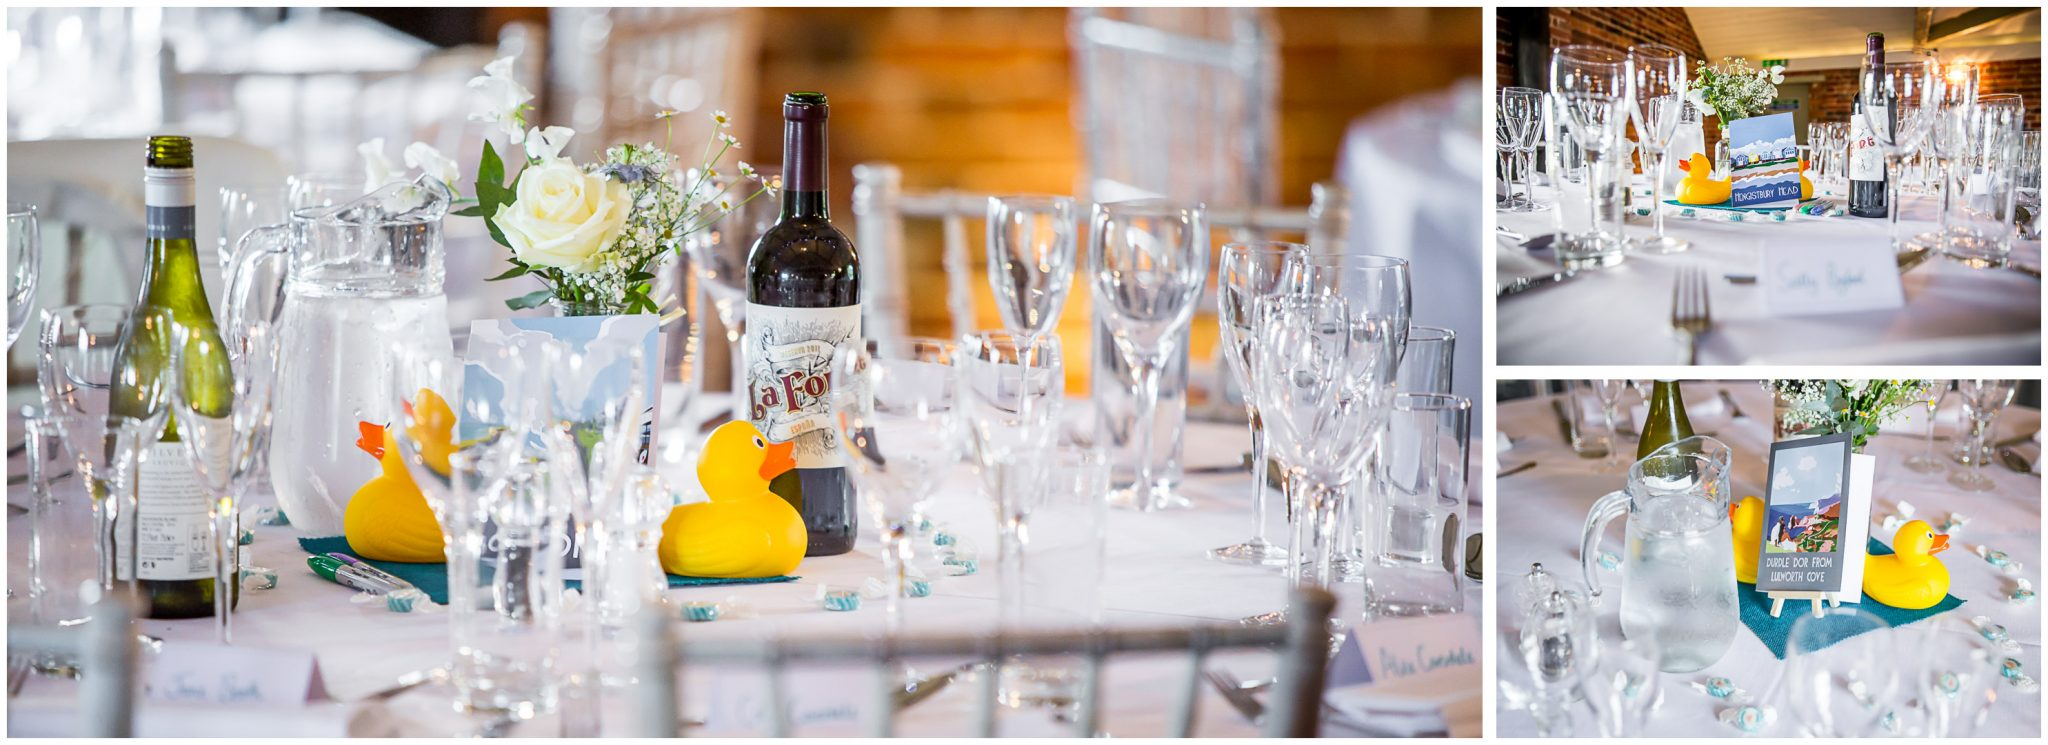 Sopley Mill Summer wedding table settings